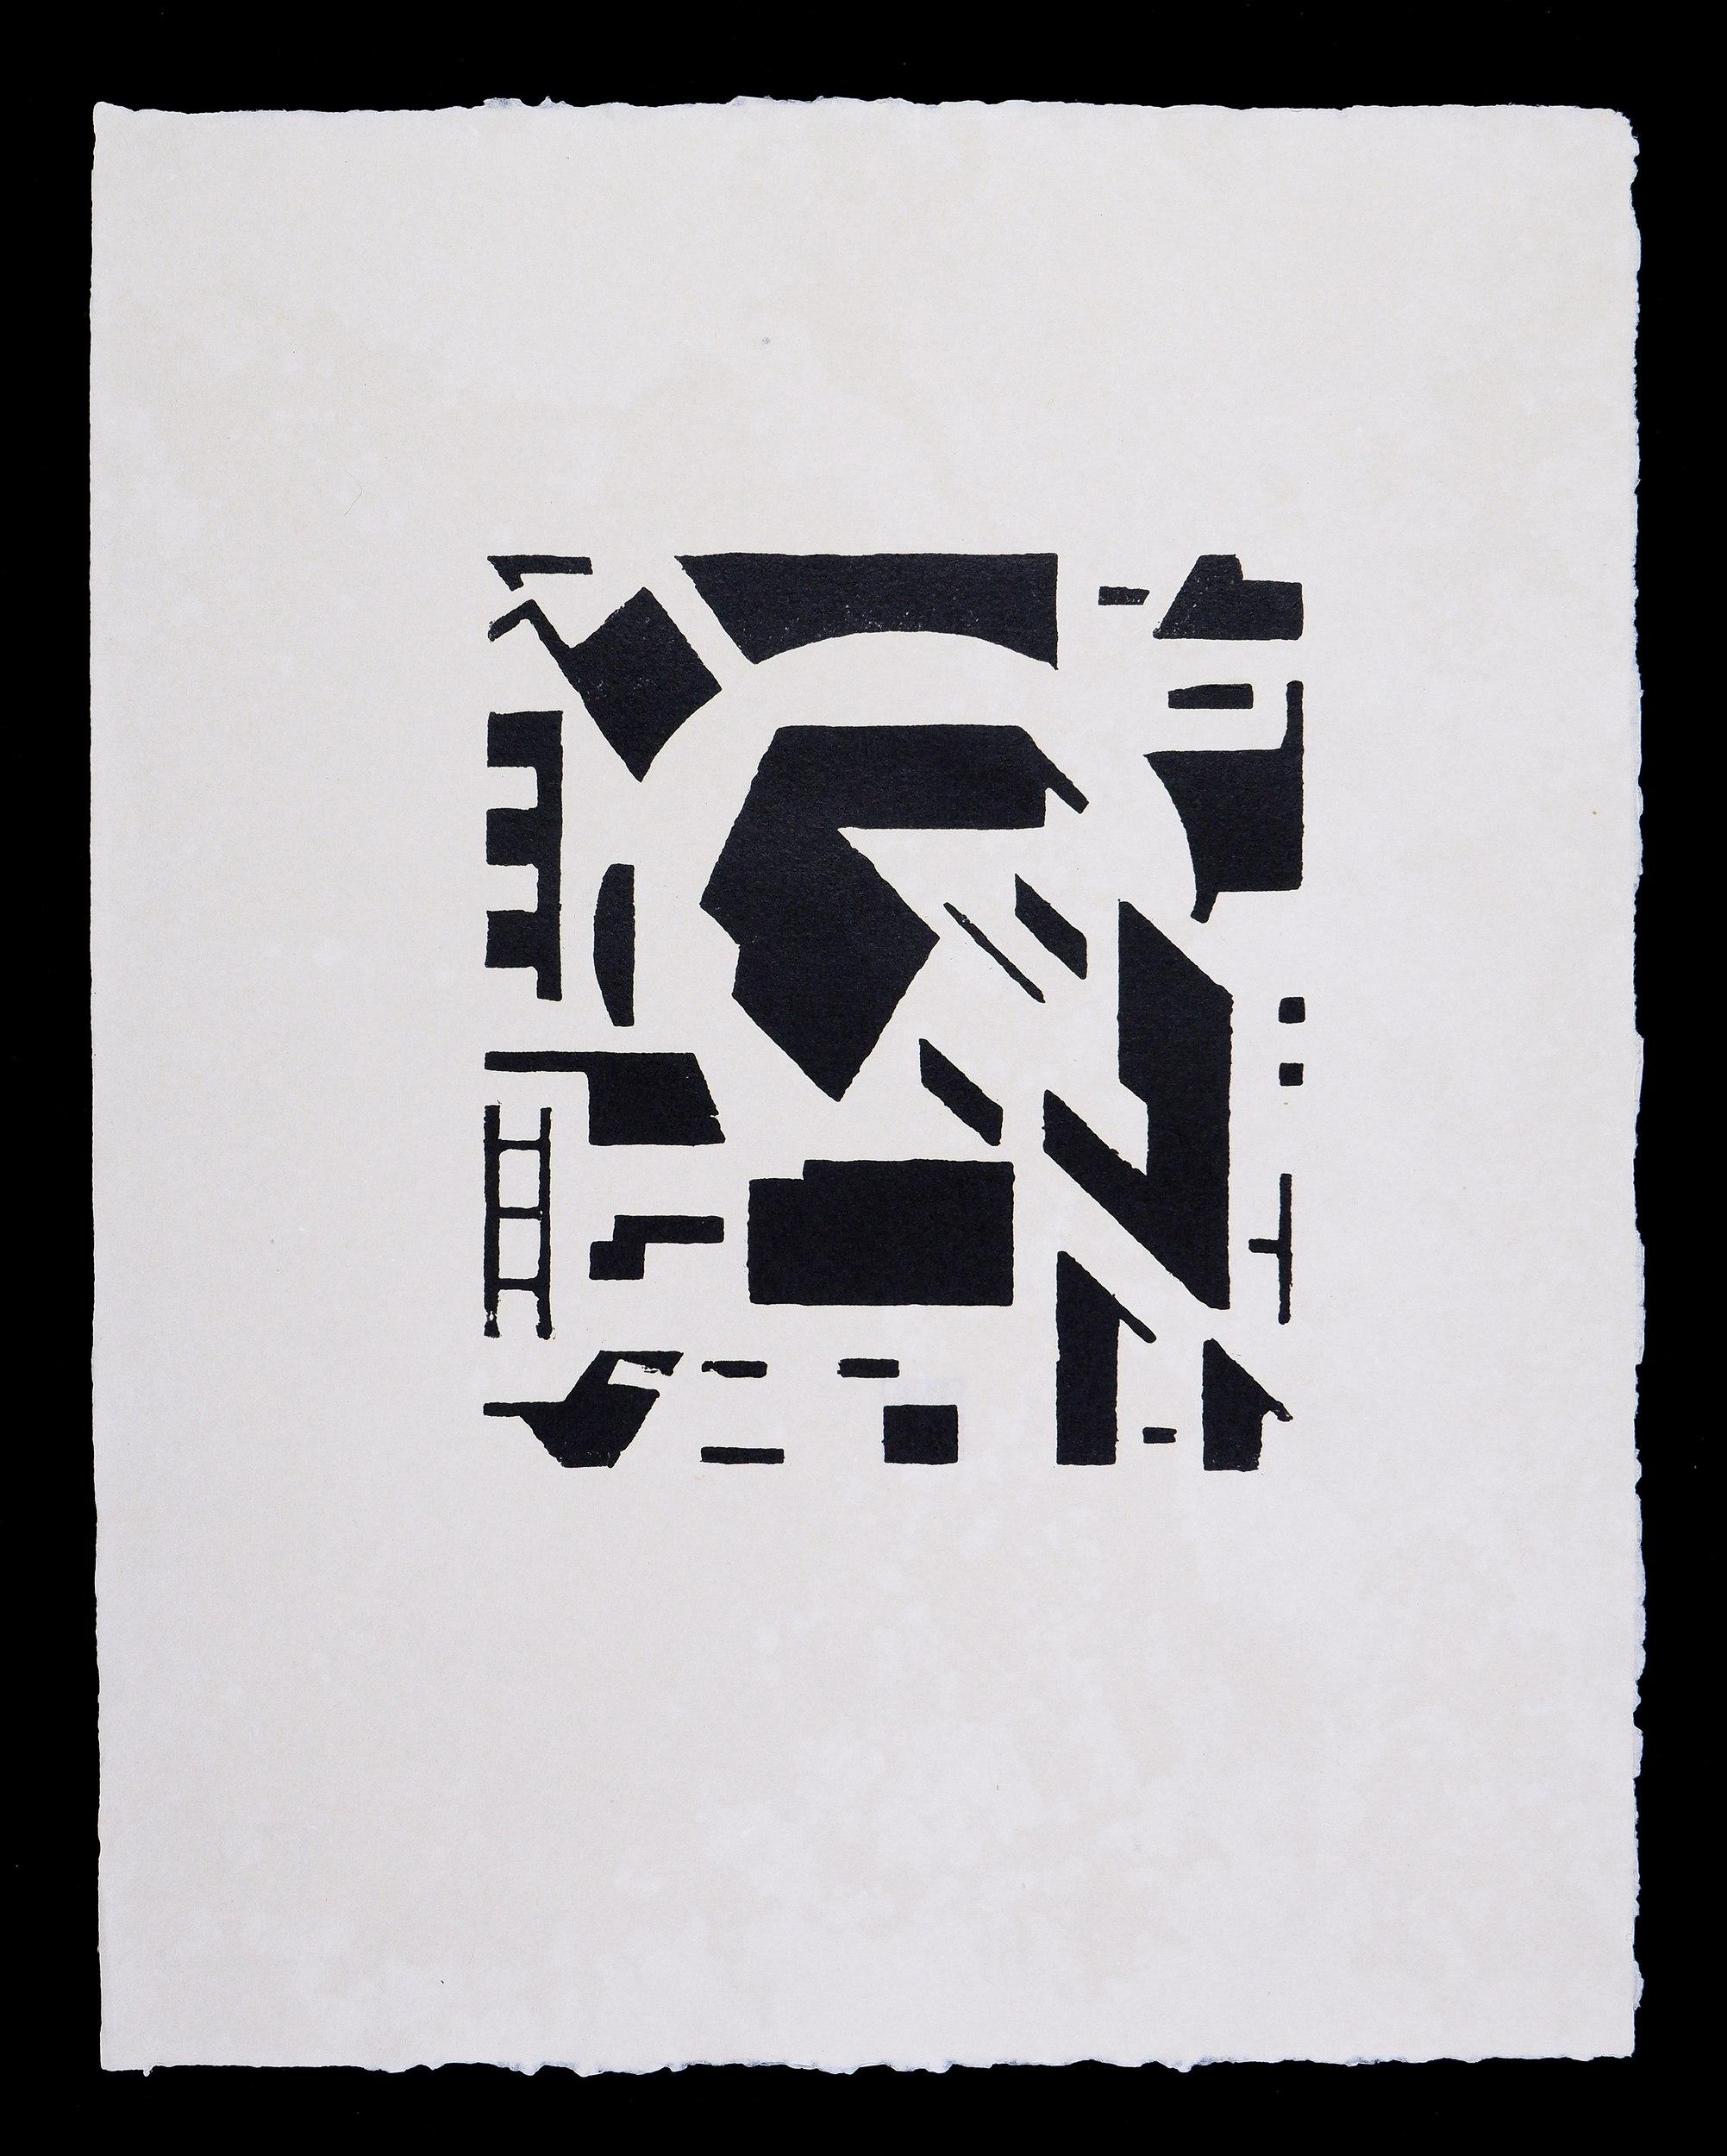 'Erich Buchholz (1891-1972, German), No. 6 1918/21, Woodcut, 23 x 21 cm (image size)'